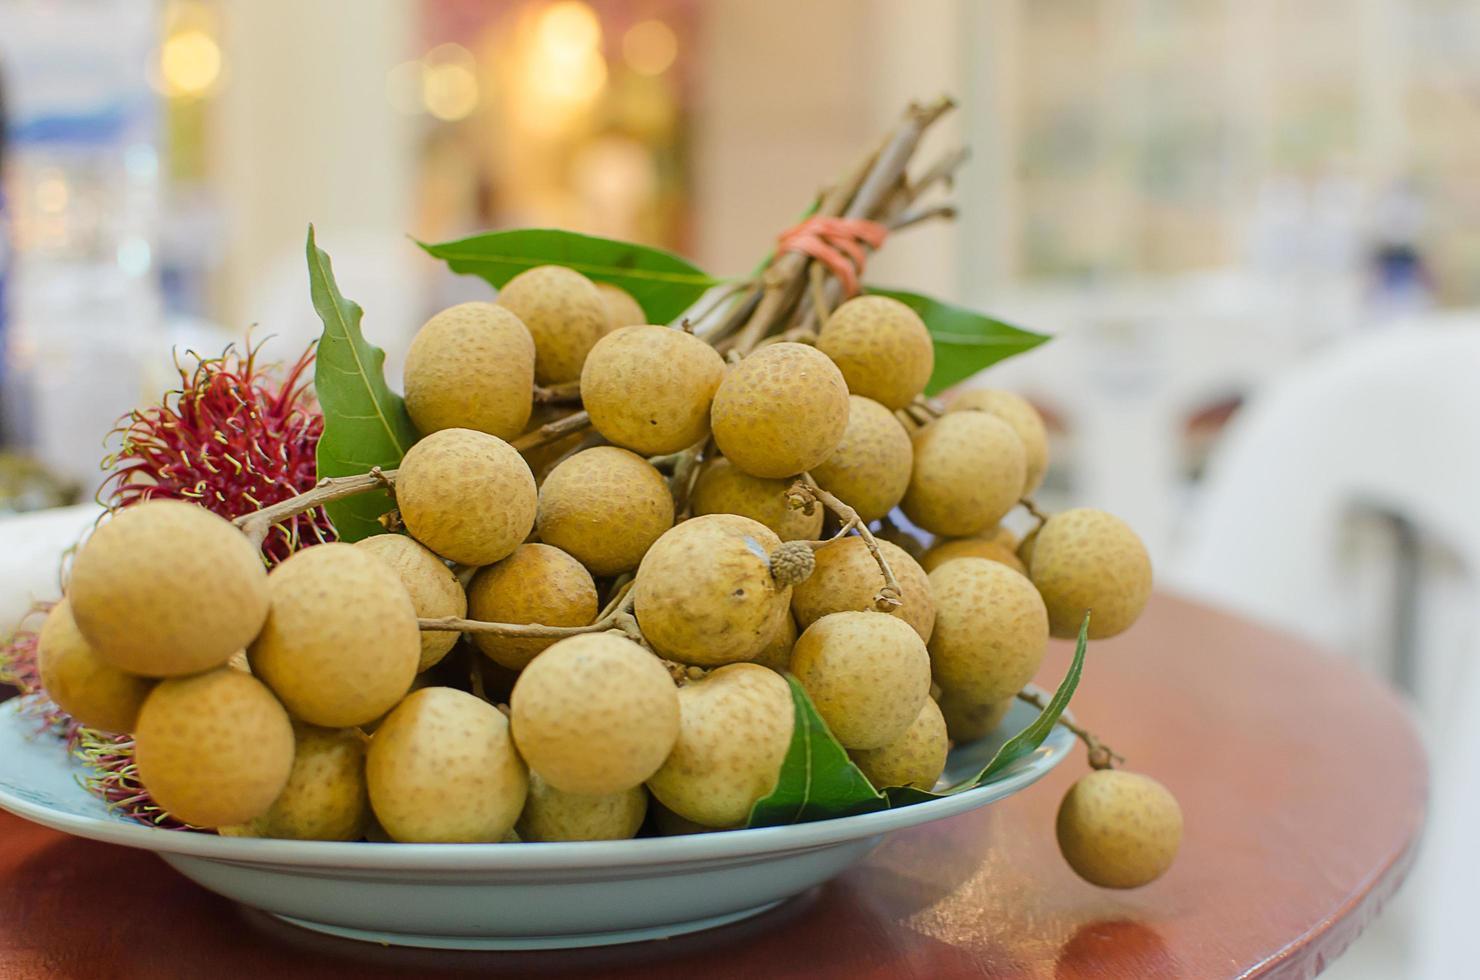 fruit longane dans un bol photo